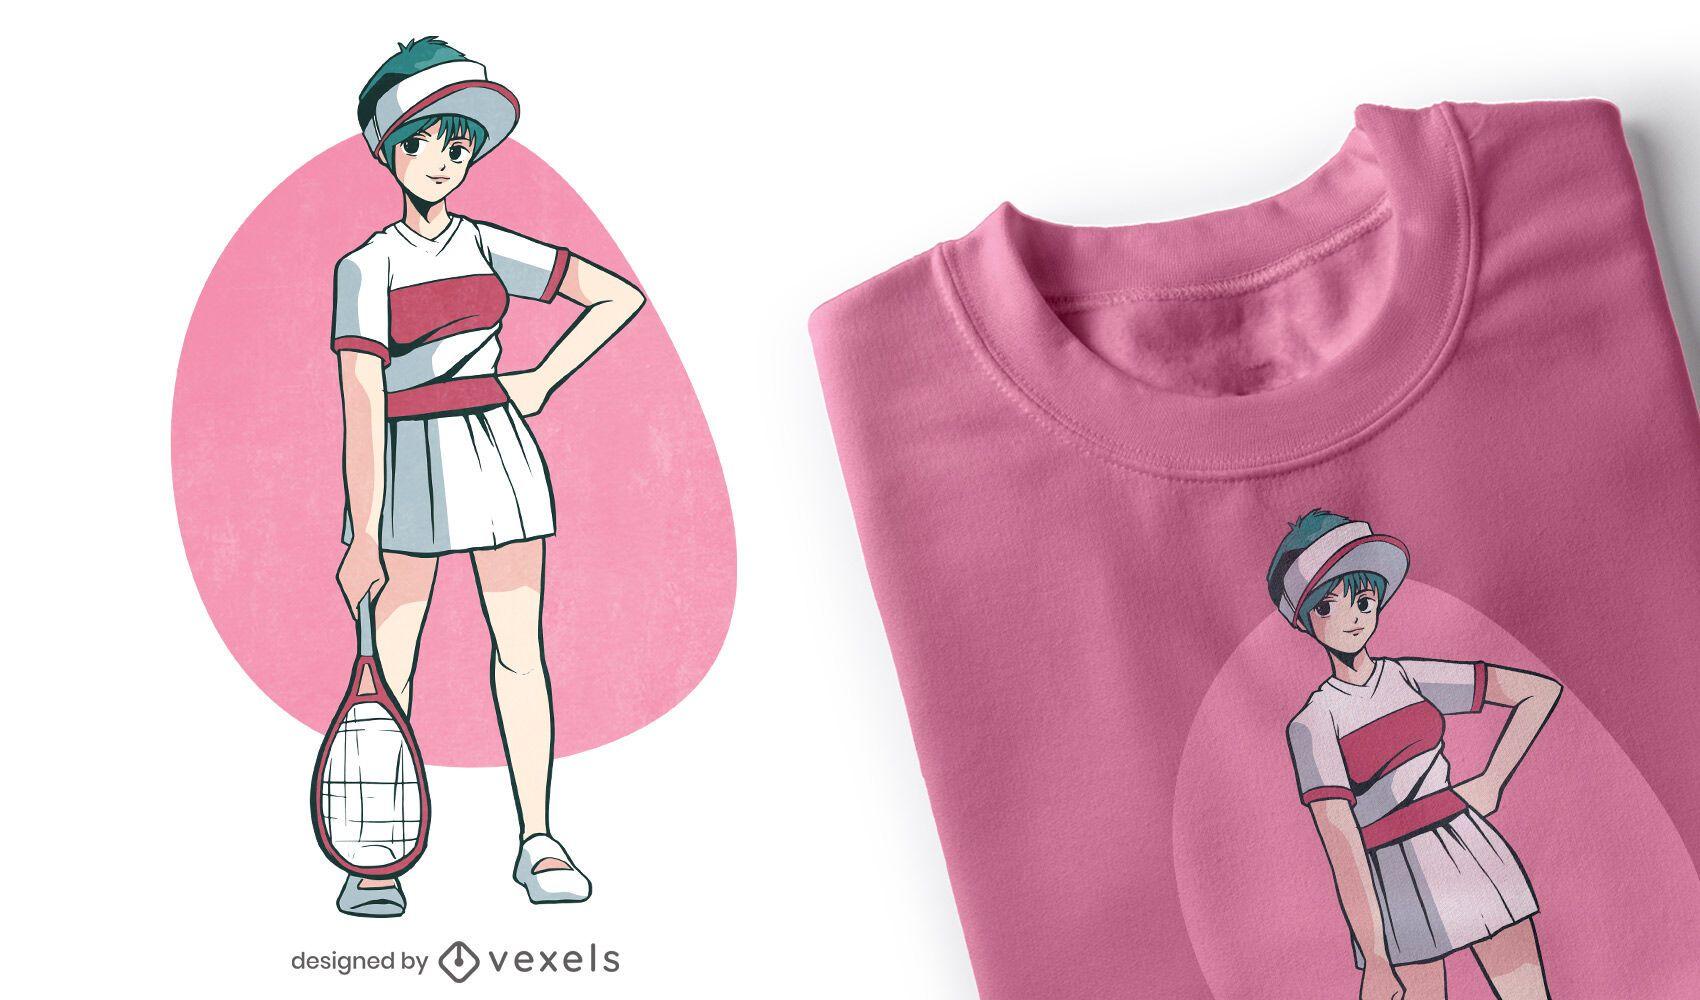 Anime tennis girl character t-shirt design